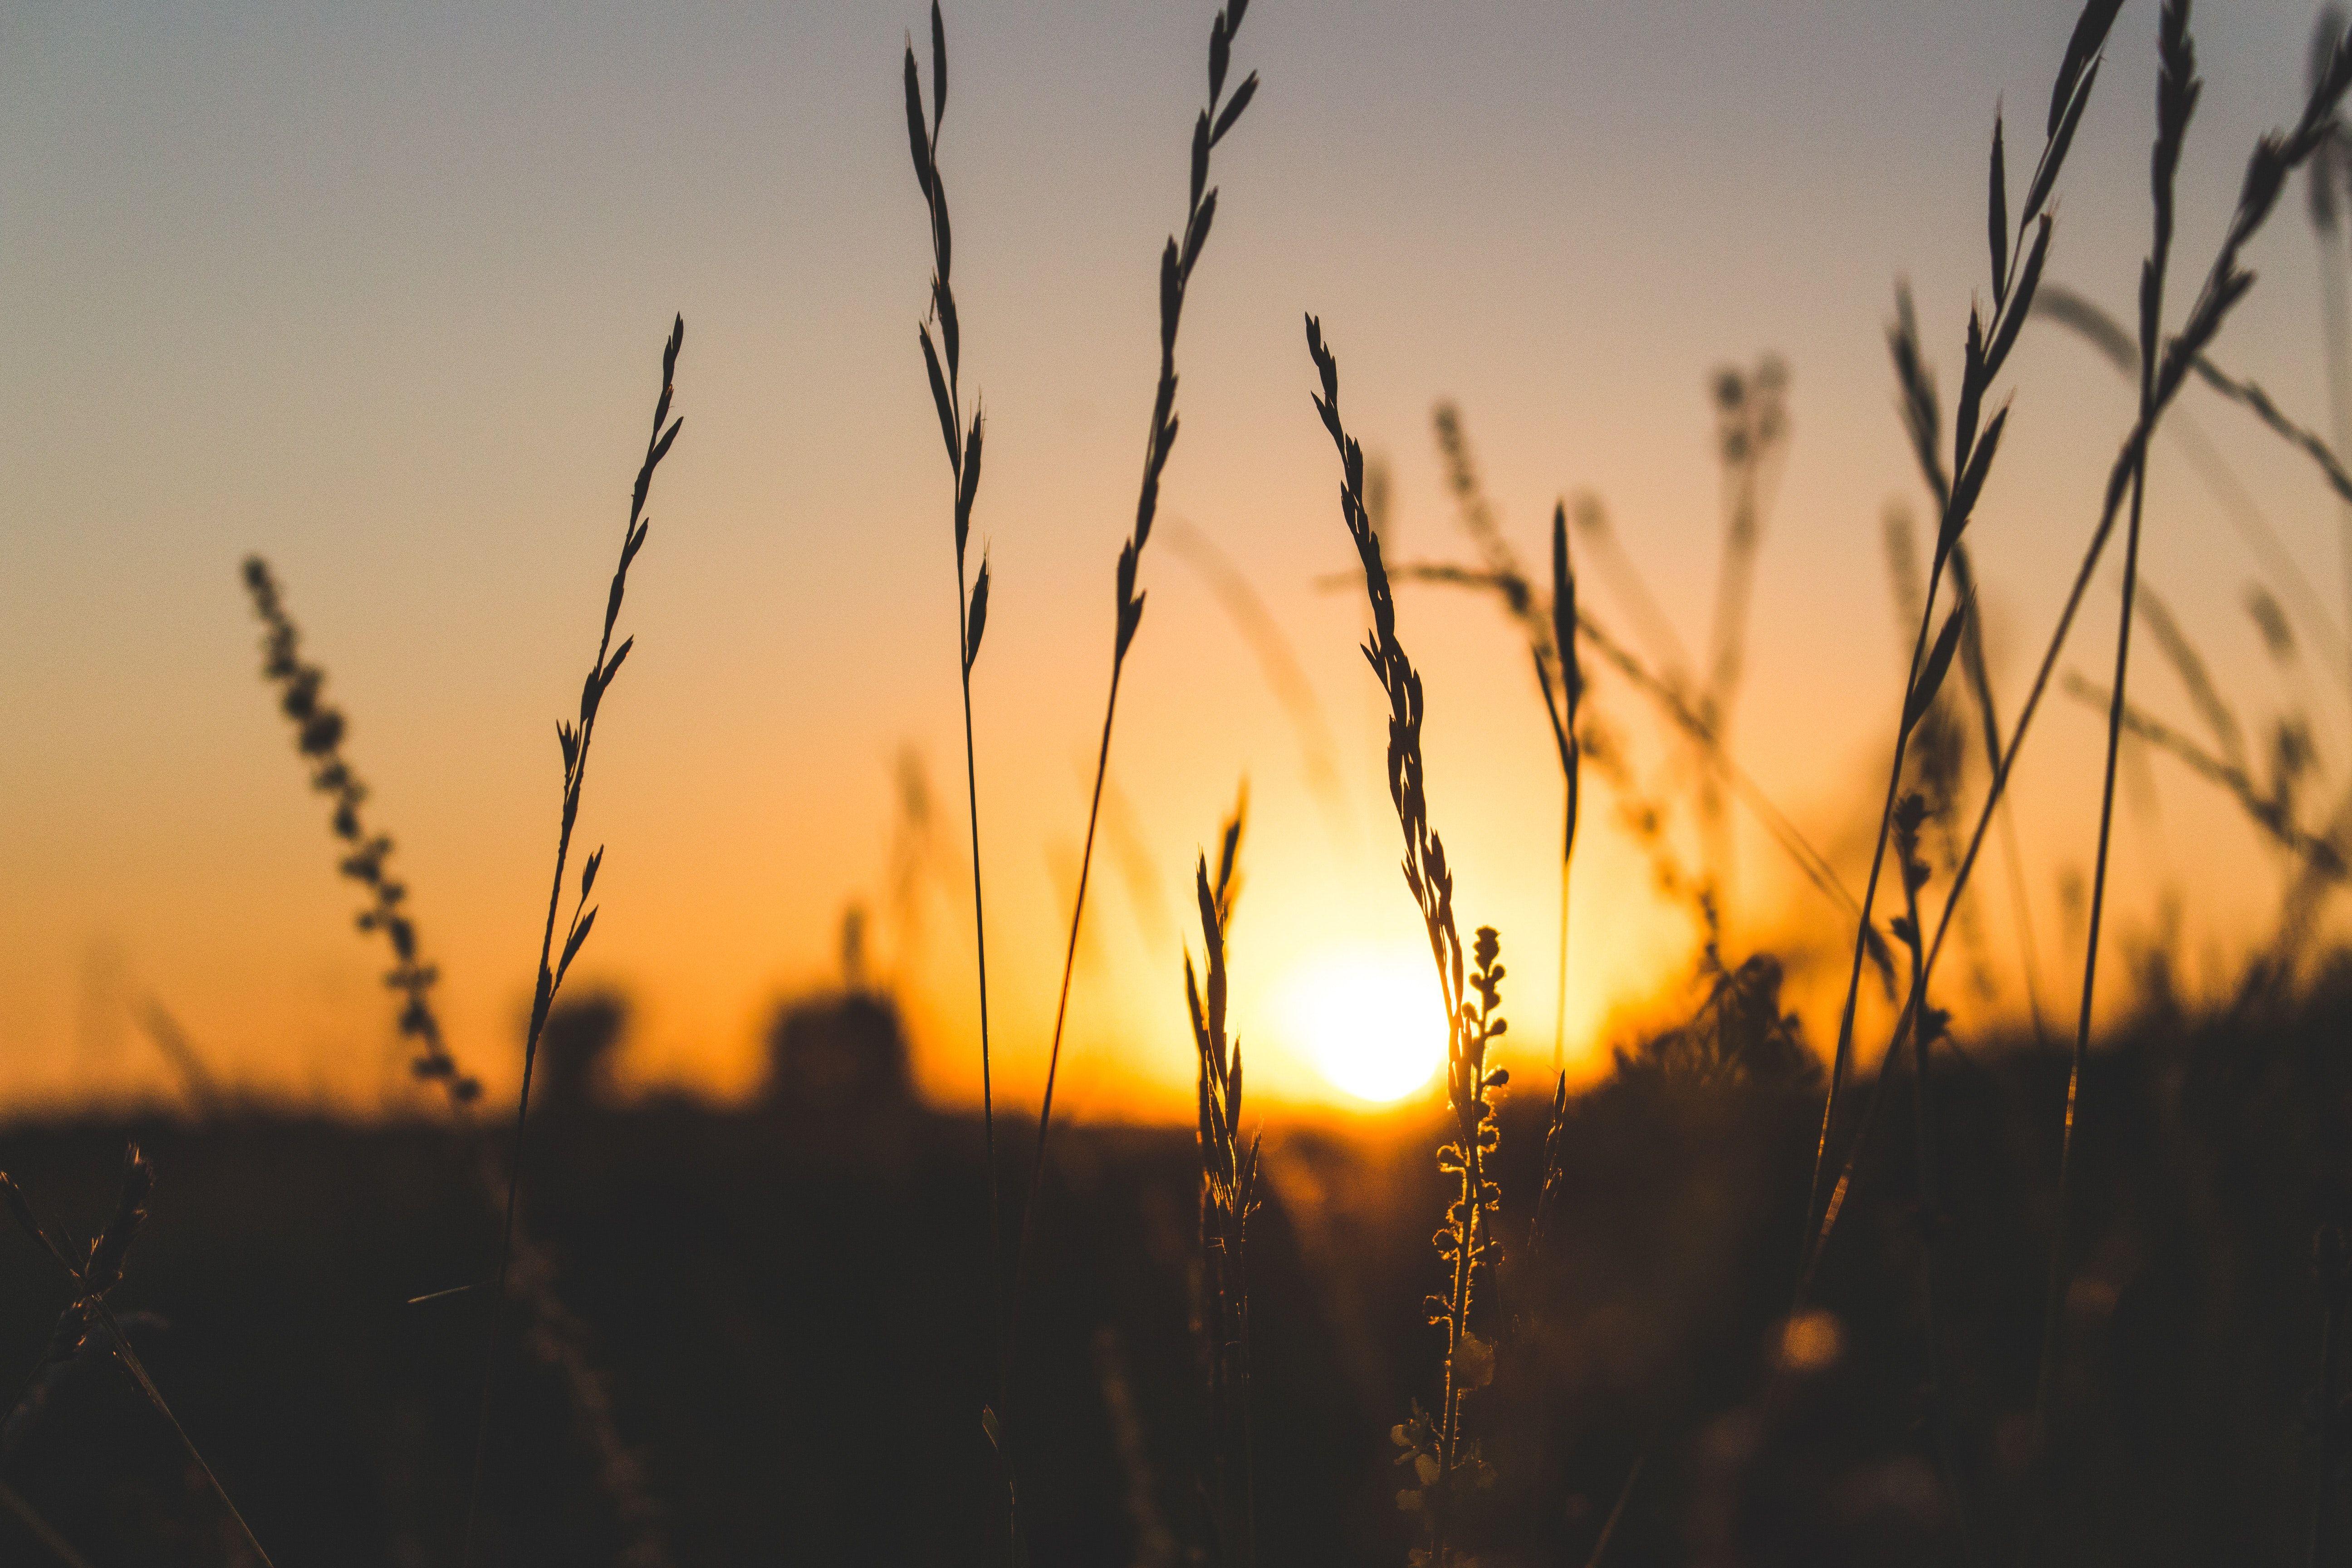 Pin By Soulistic Remedies On Www Soulisticremedies Com Sunset Colors Landscape Green Landscape